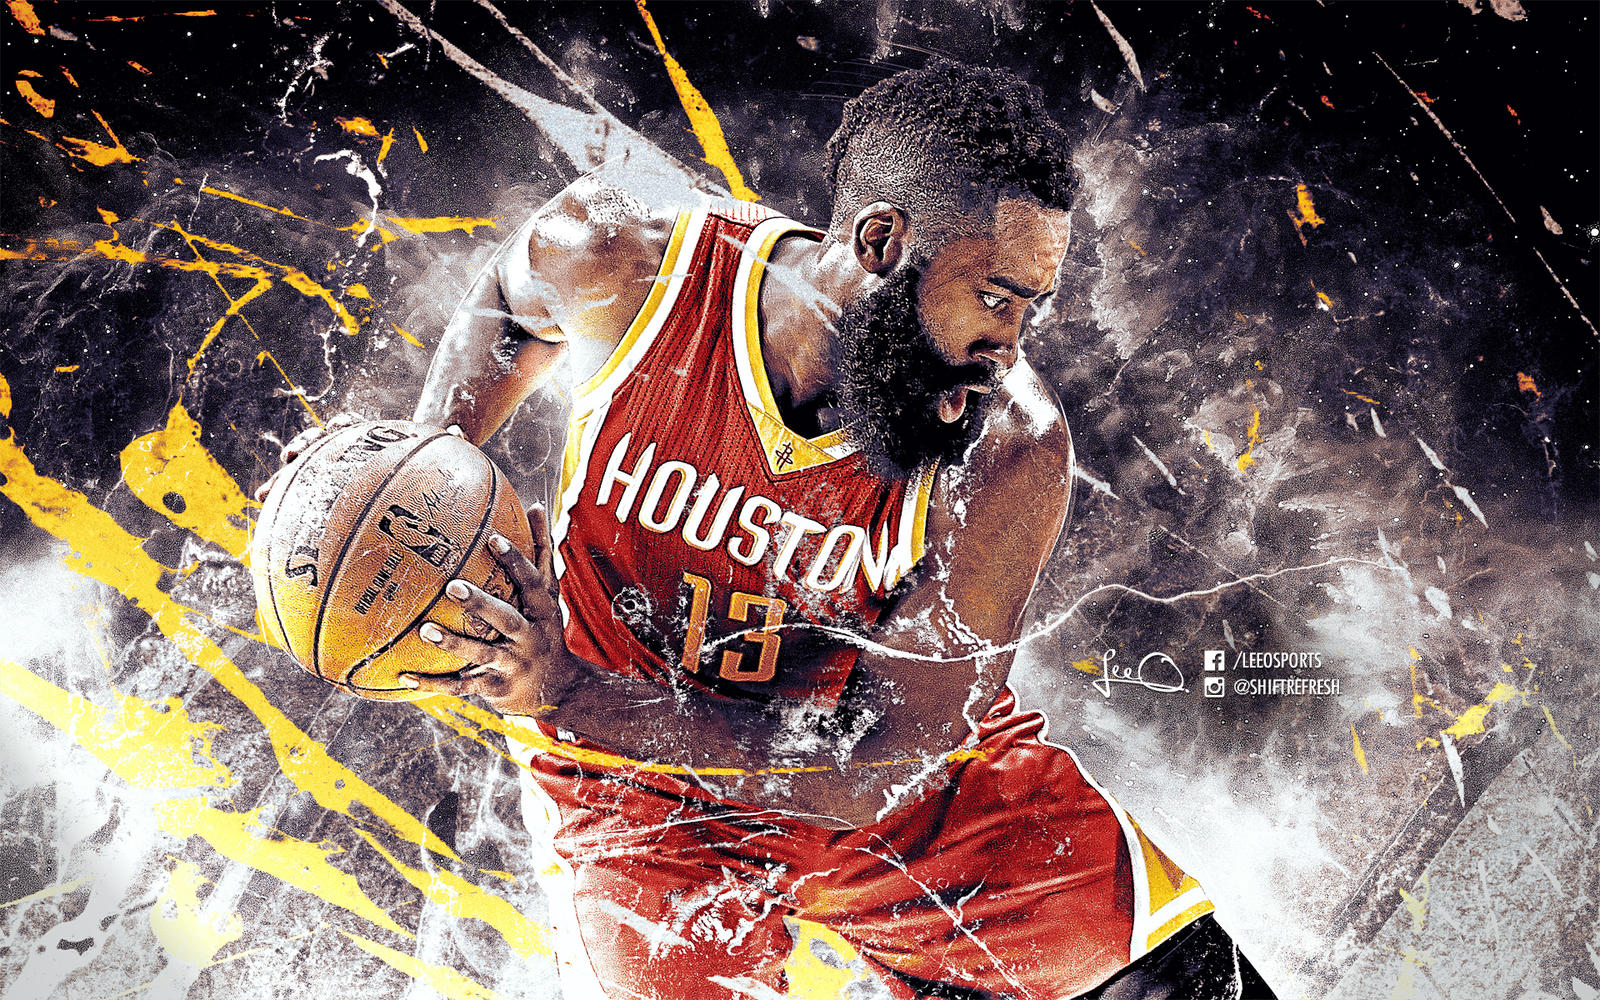 Basketball Player James Harden Wallpaper: James Harden NBA Wallpaper By Skythlee On DeviantArt